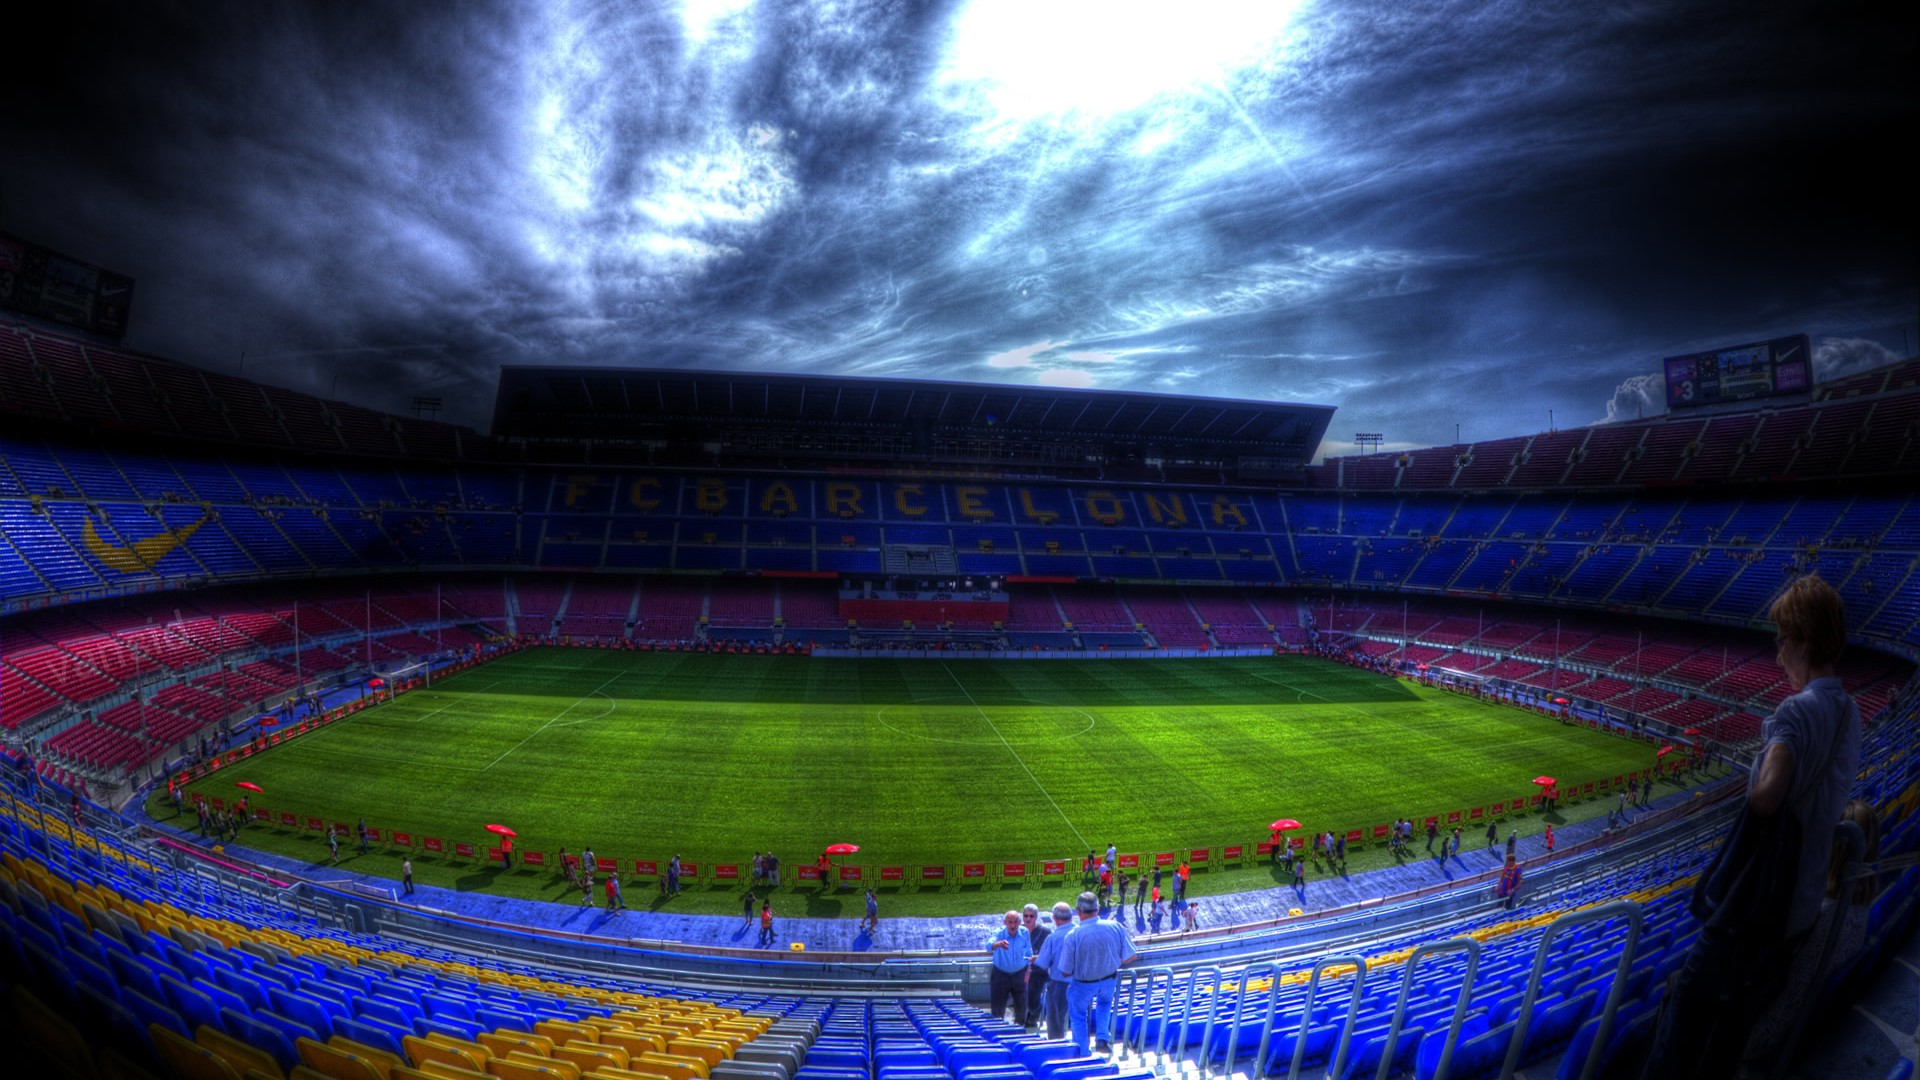 Messi Quotes Wallpaper Hd Camp Nou Stadium Wallpaper Download Free Pixelstalk Net